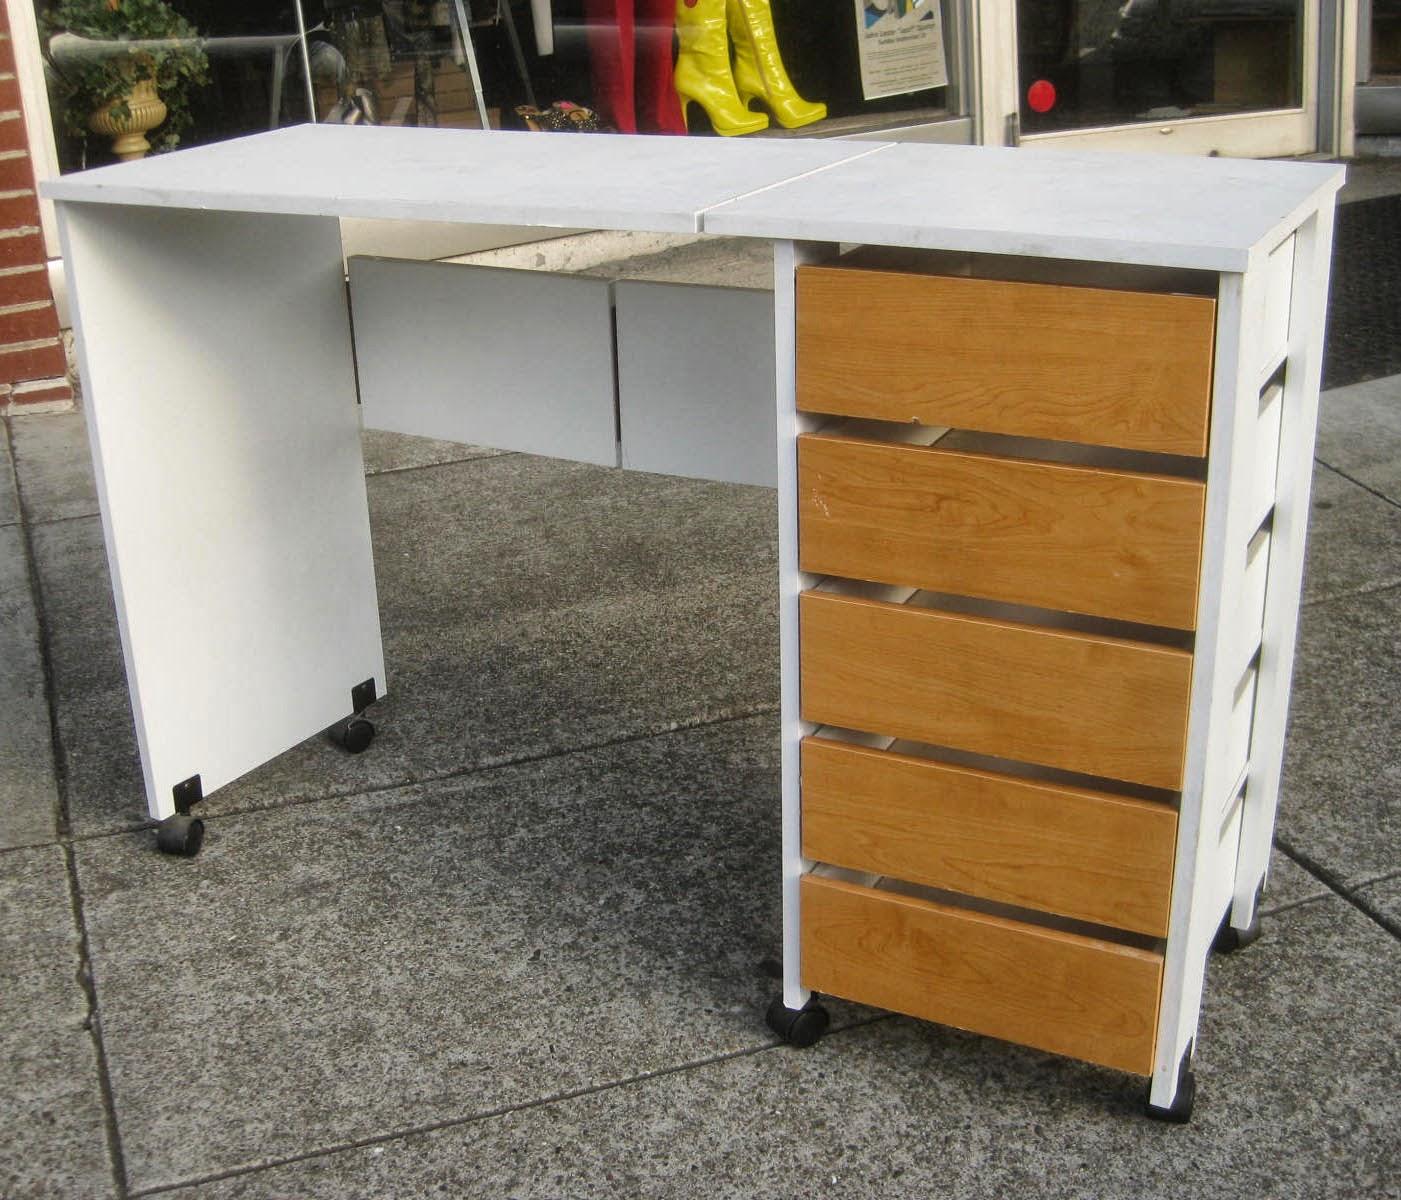 UHURU FURNITURE U0026 COLLECTIBLES: SOLD   Retractable Desk   $40